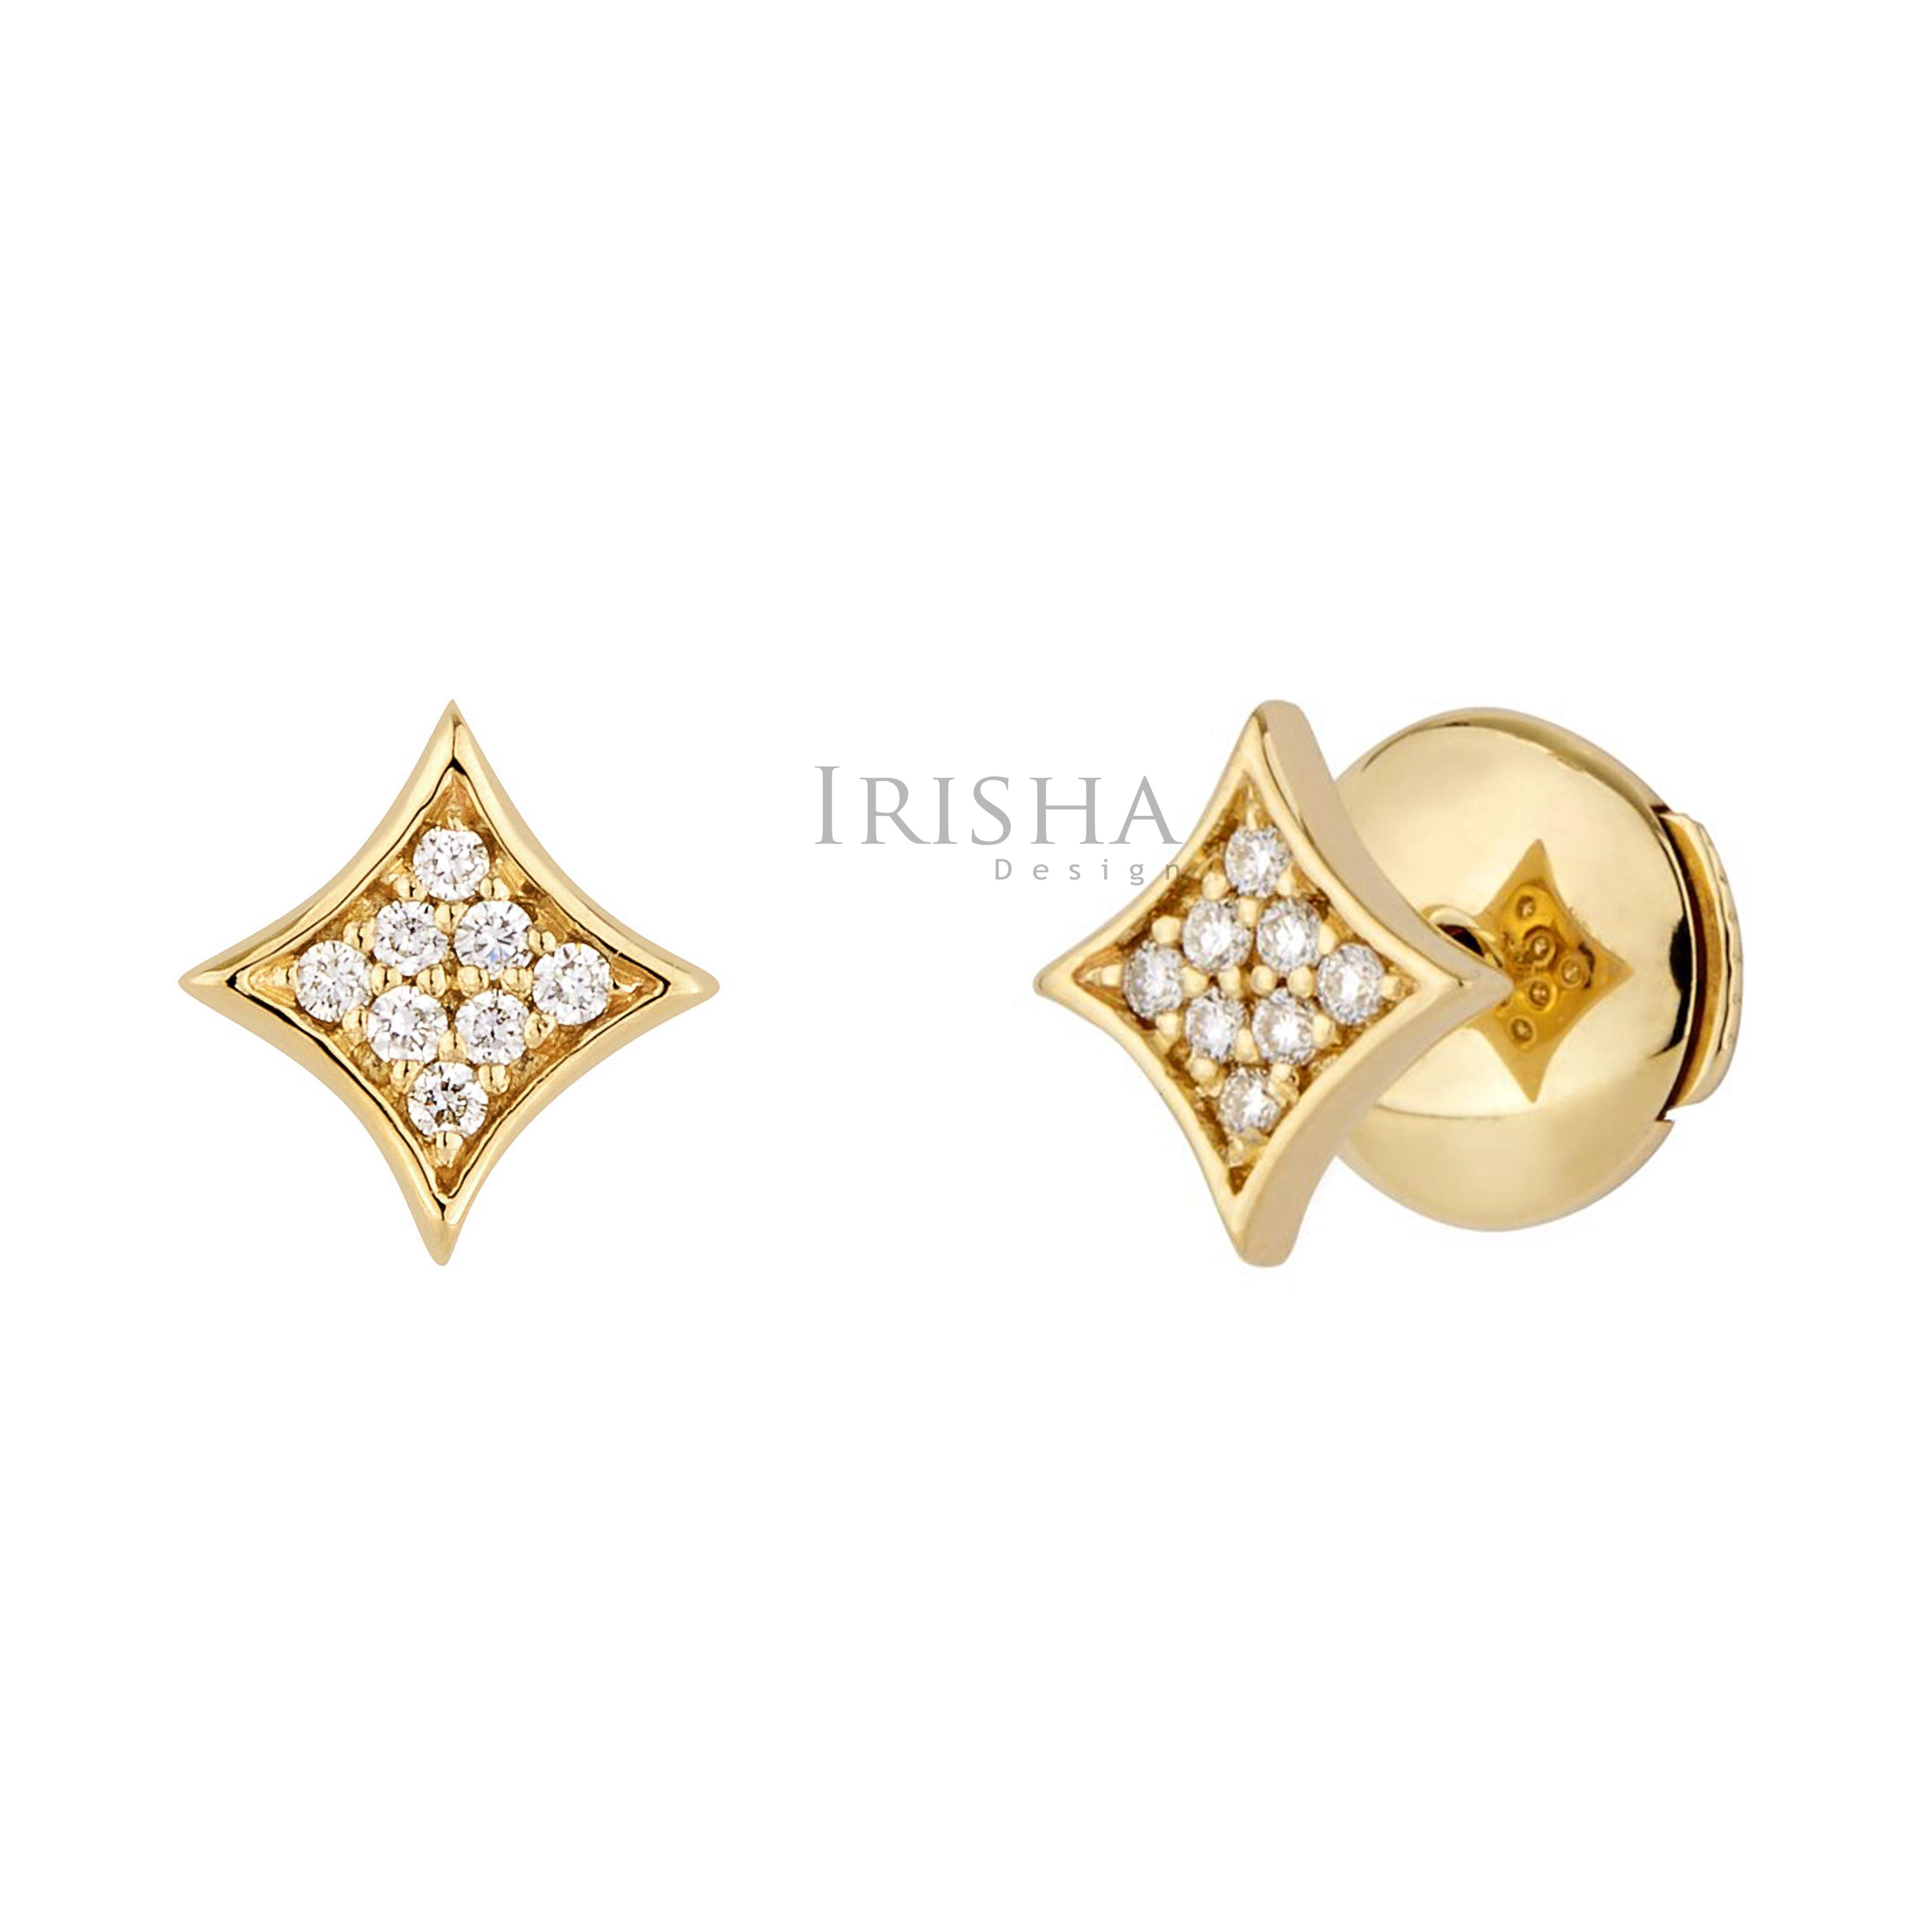 14K Gold 0.12 Ct. Genuine Diamond Rhombus Shape Tiny Studs Earrings Fine Jewelry